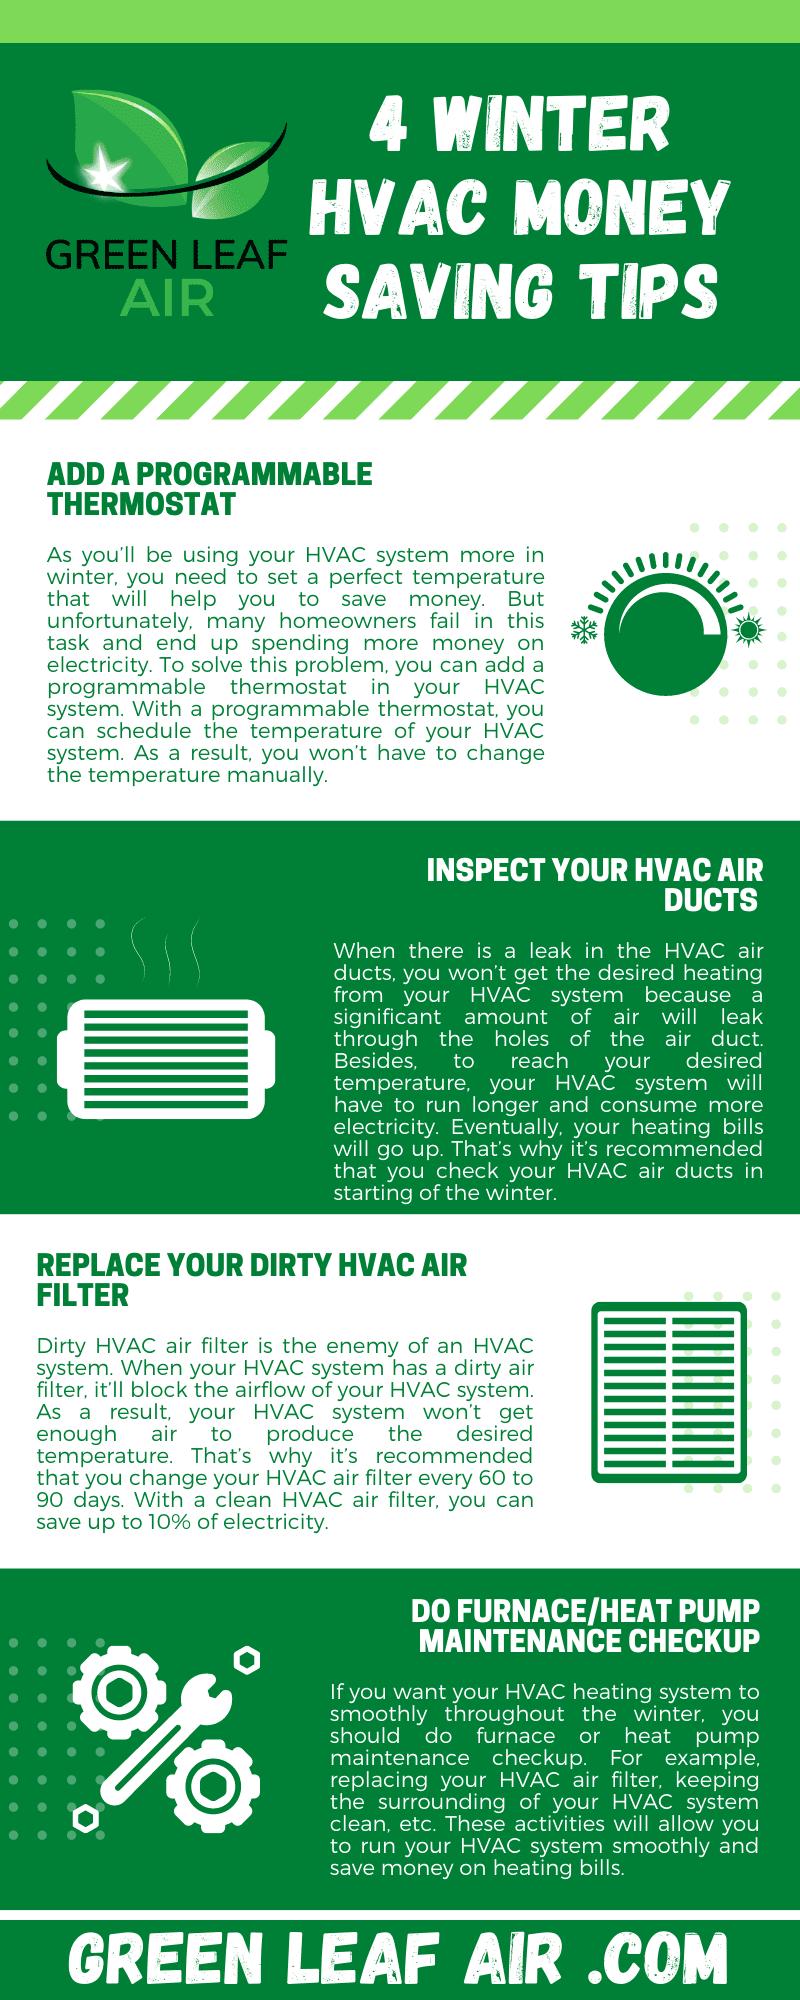 4 Winter HVAC Money Saving Tips